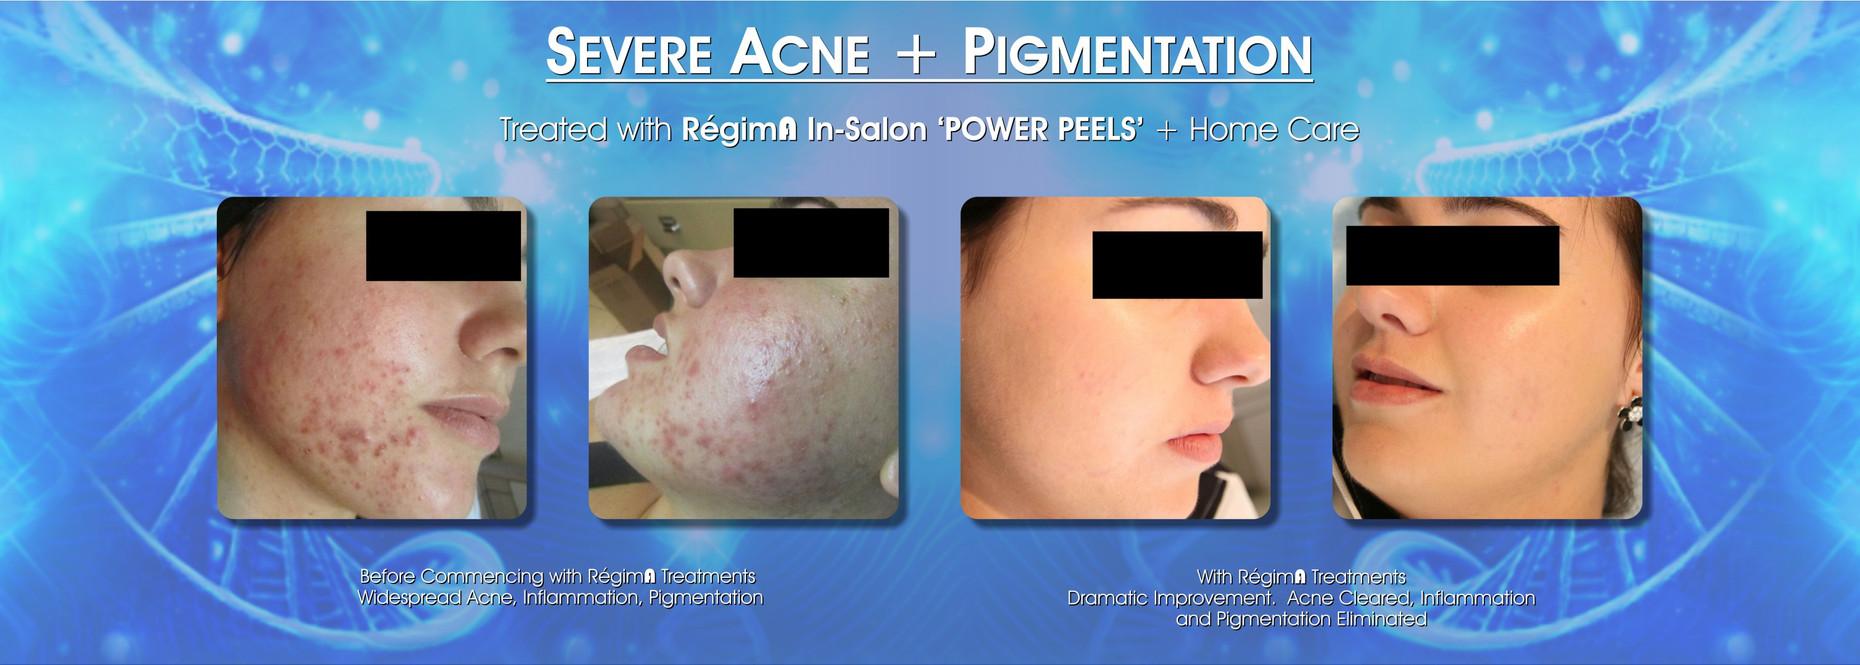 Severe Acne + Pigmentation Treatment